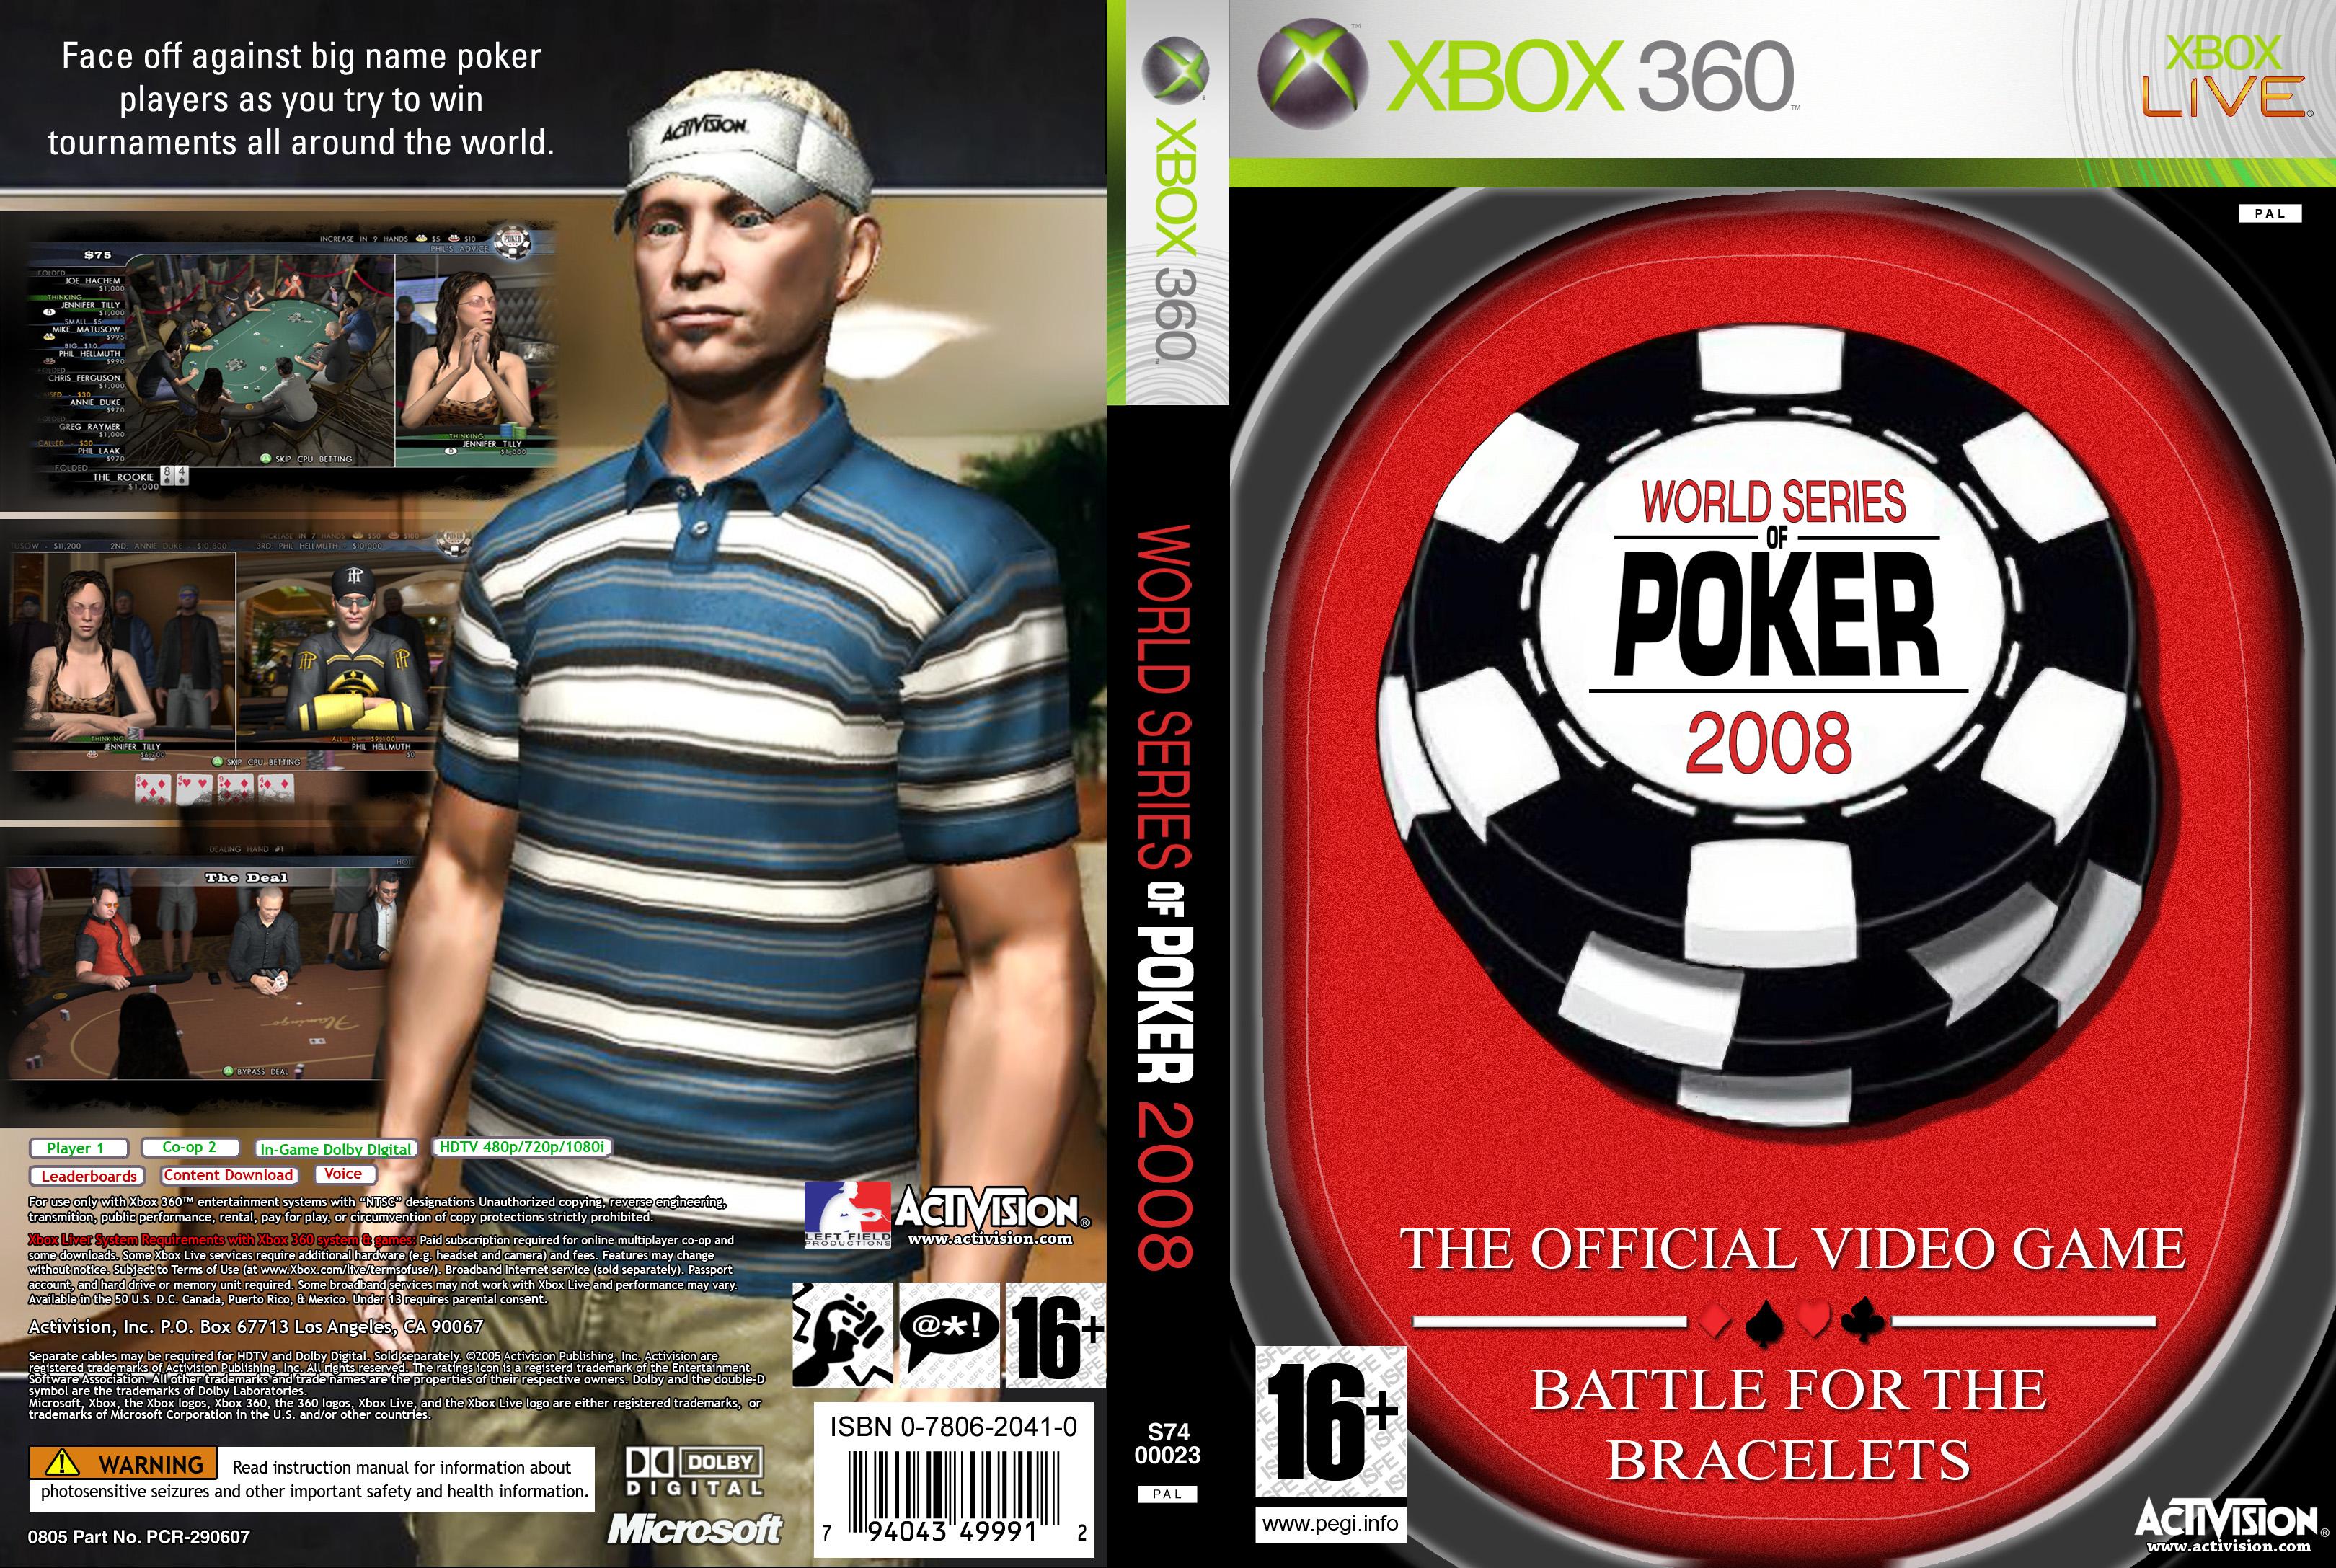 World Series Poker Game 2008